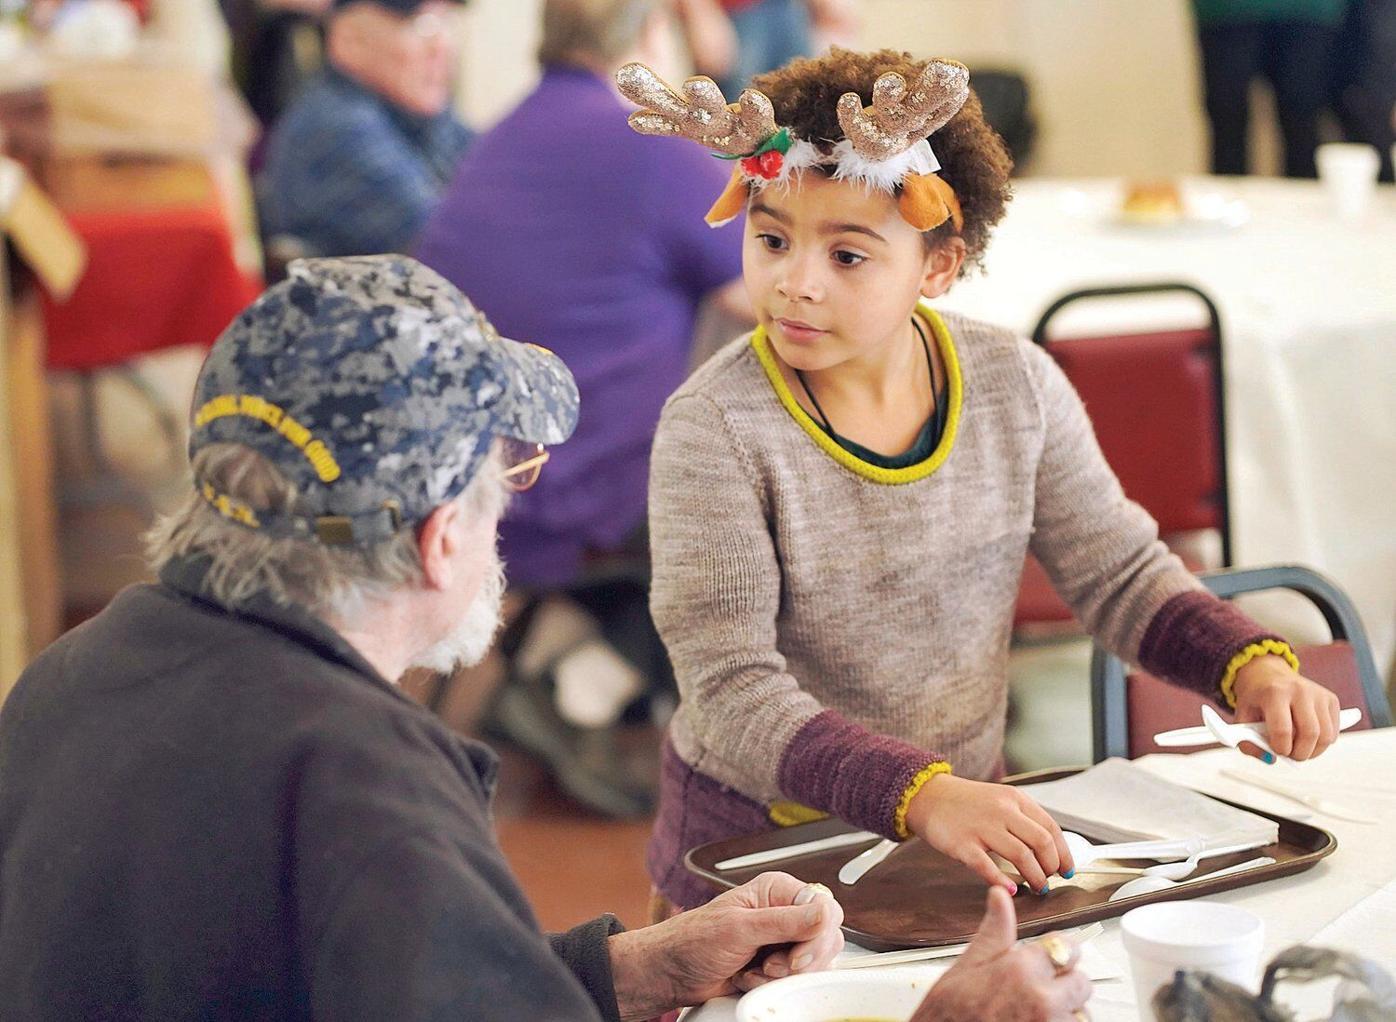 Dedicated American Legion crew in North Adams prepares hundreds of free Christmas meals